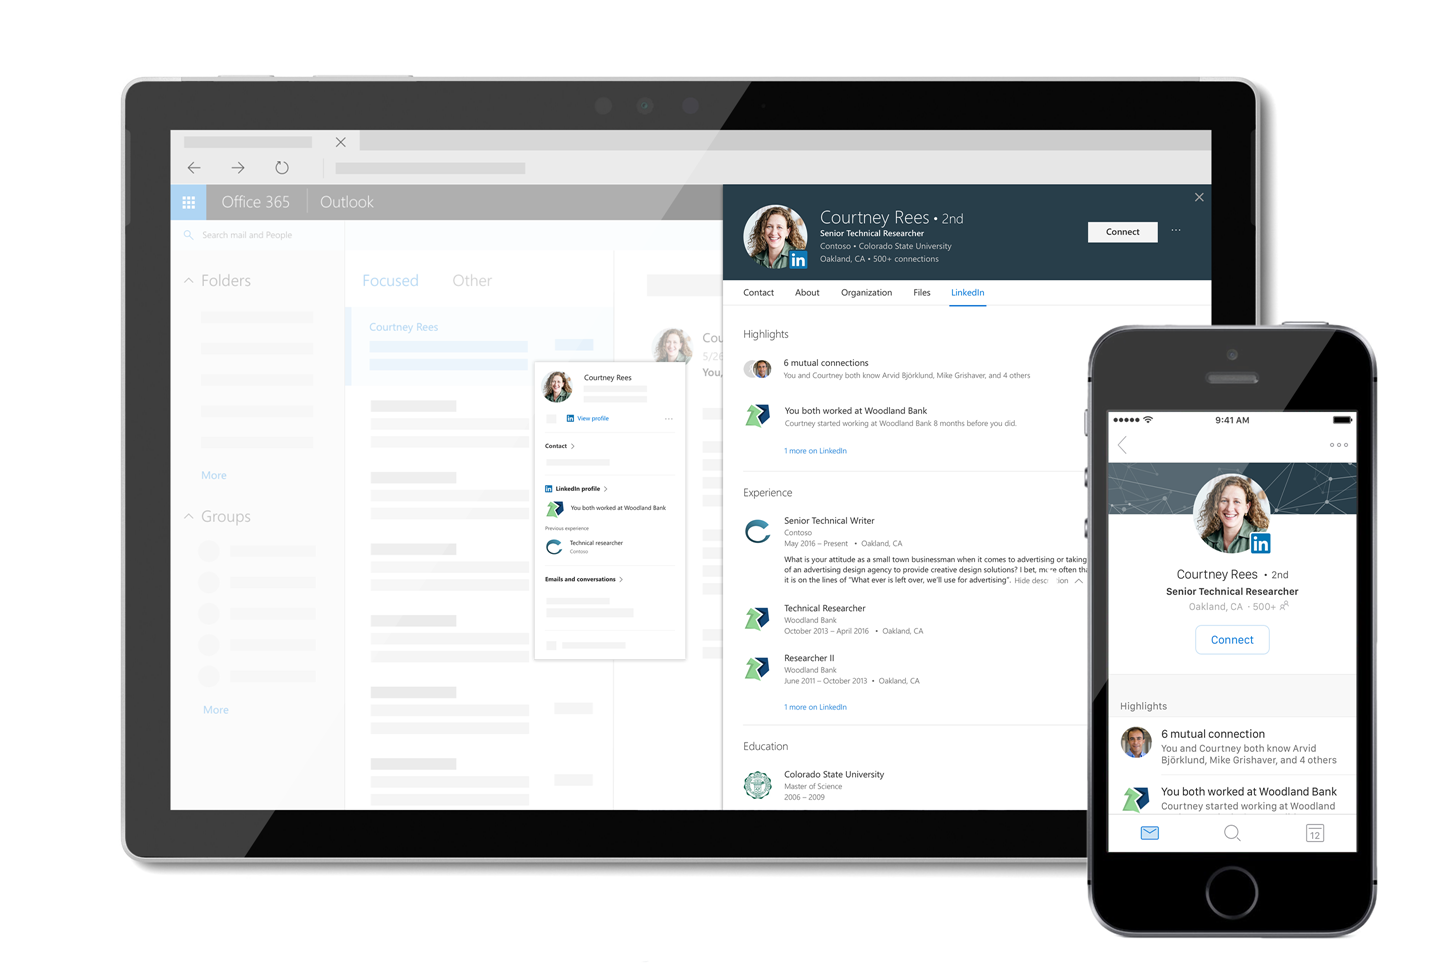 LinkedIn ในแอป Microsoft ของคุณ